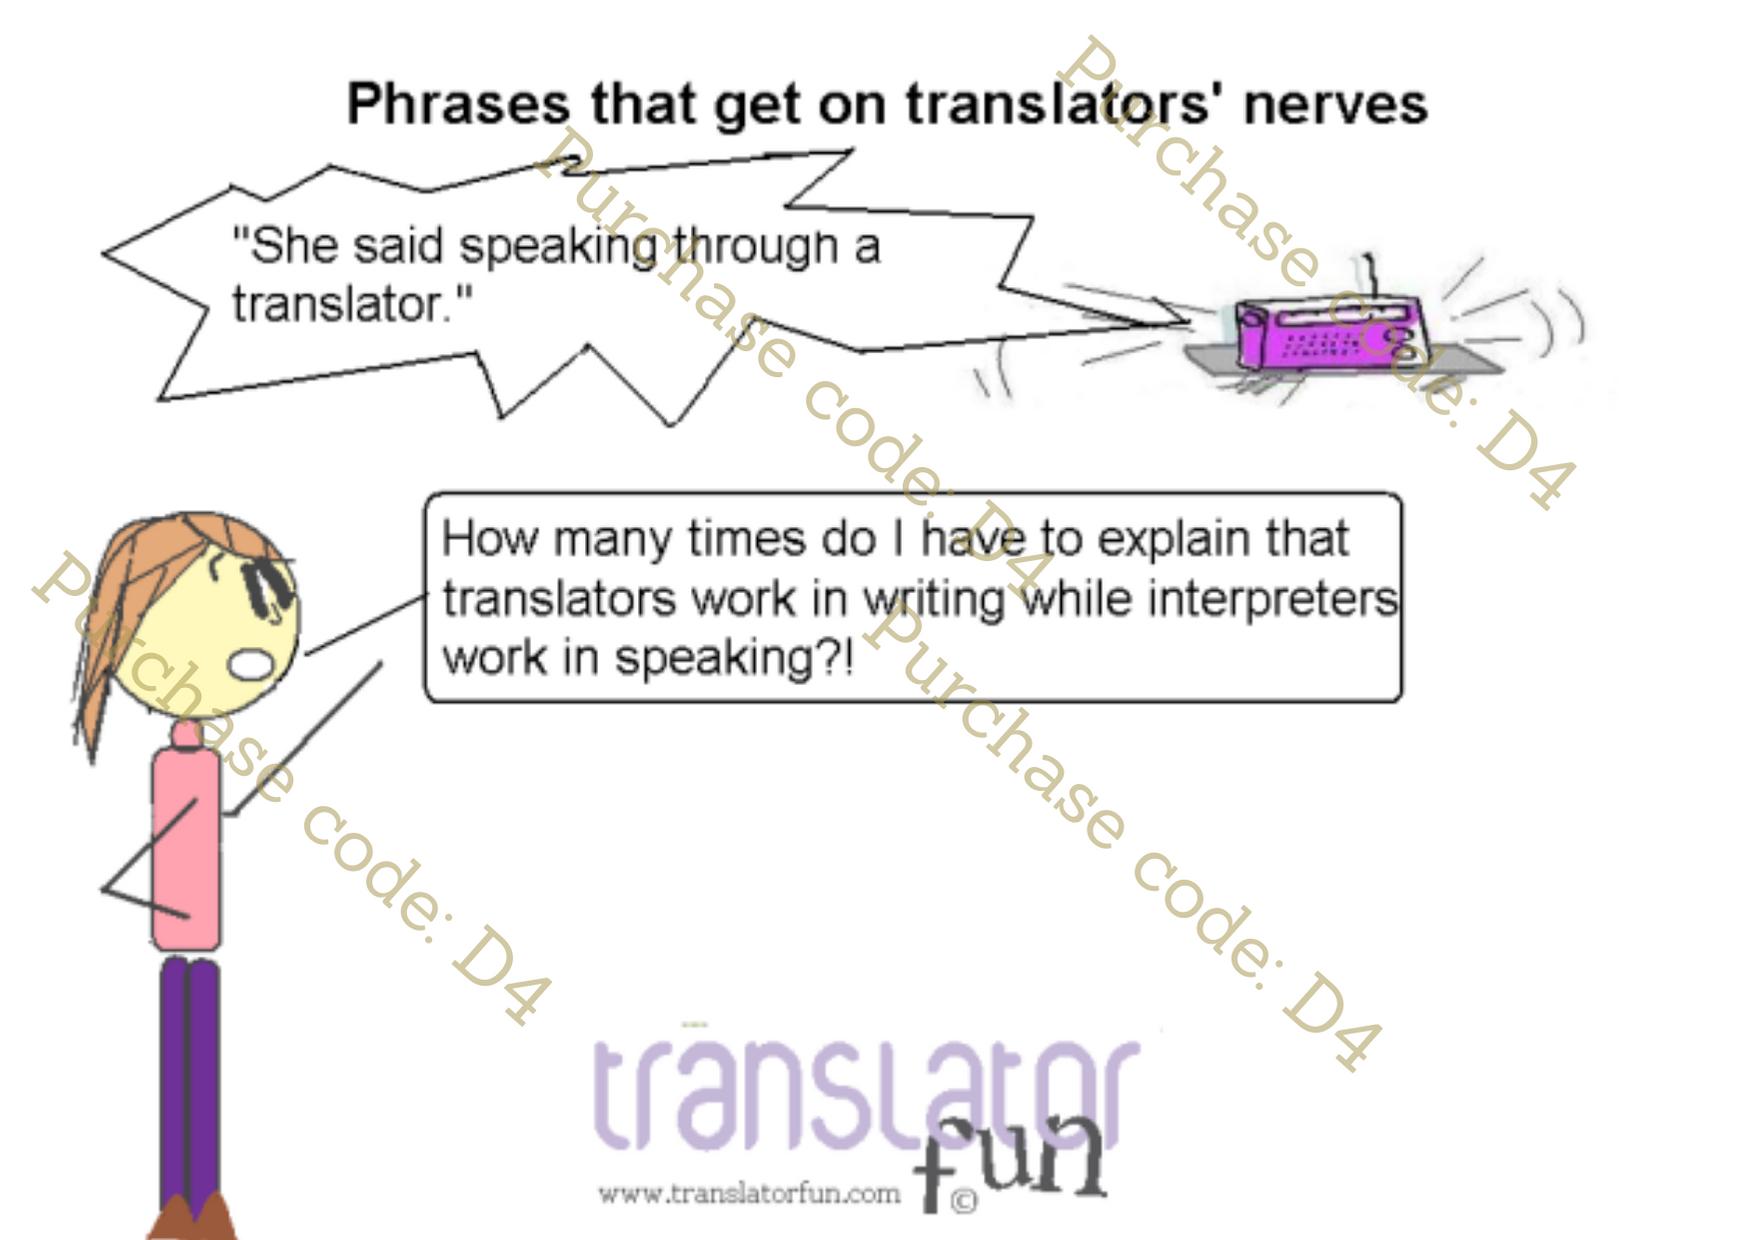 Translators vs interpreters